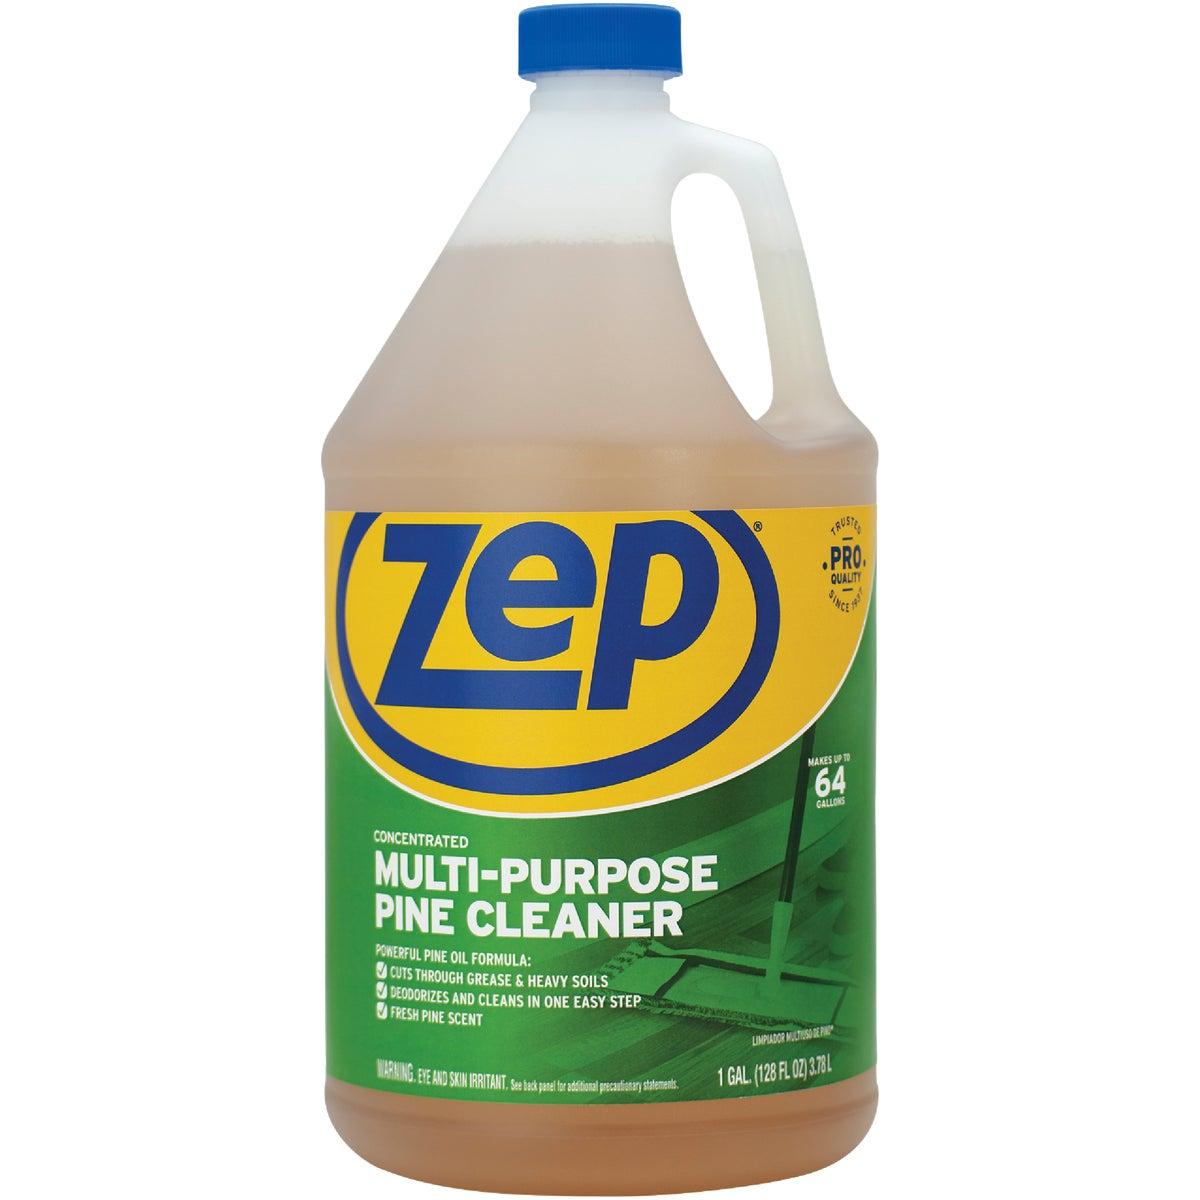 GA MLT PUR PINE CLEANER